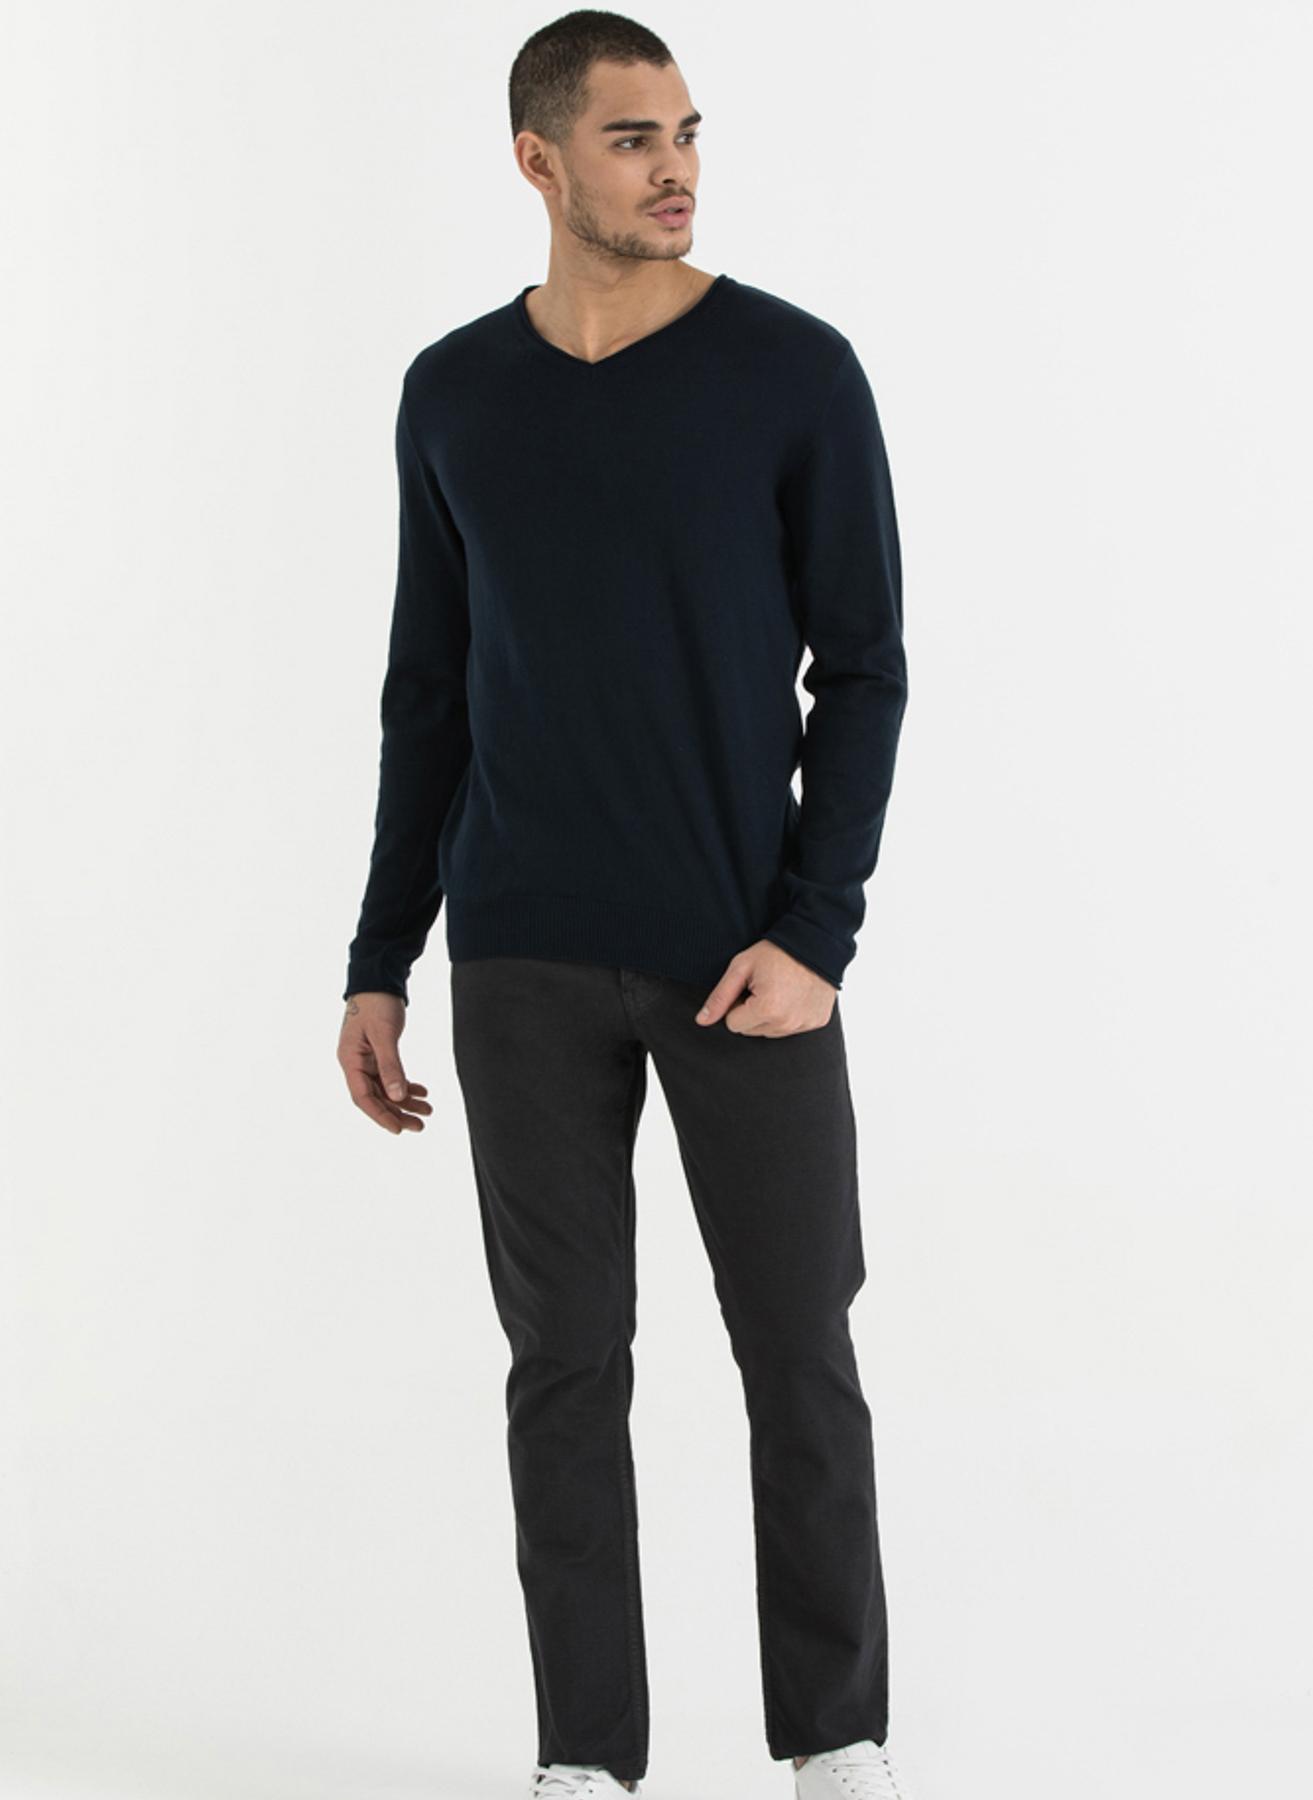 Lee Cooper Klasik Pantolon 31-30 5001699858007 Ürün Resmi